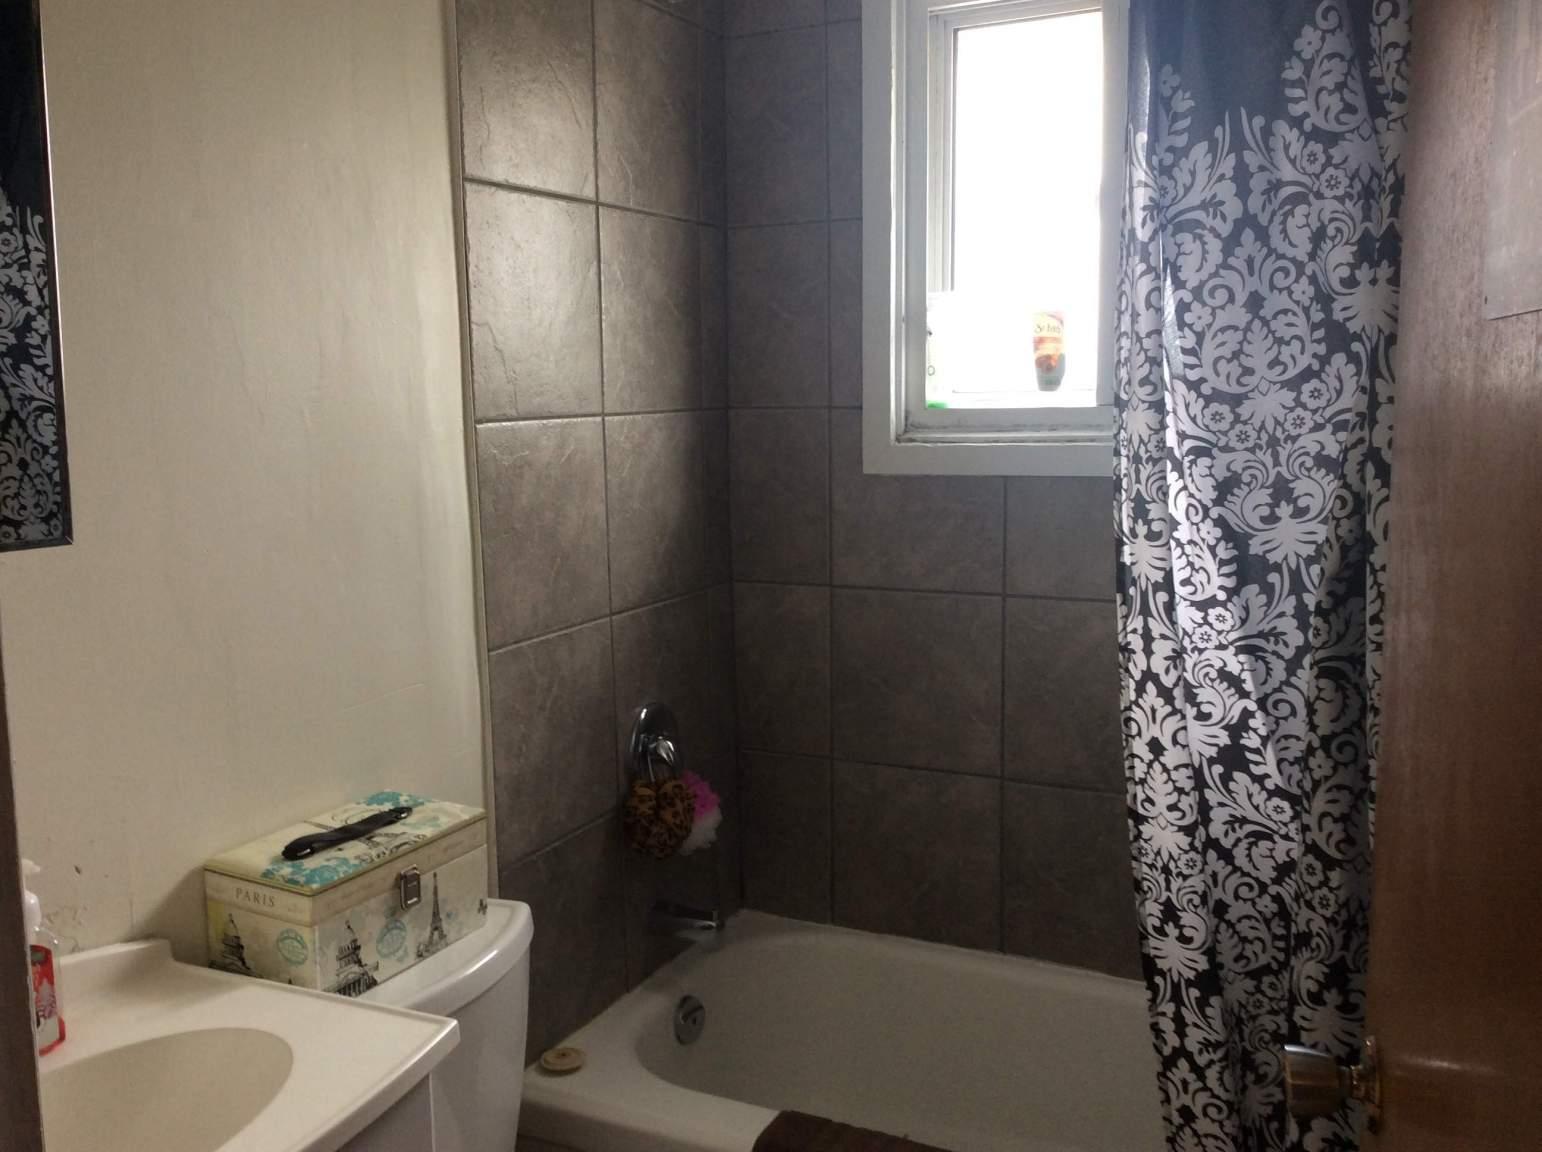 Bathroom- recently tiled